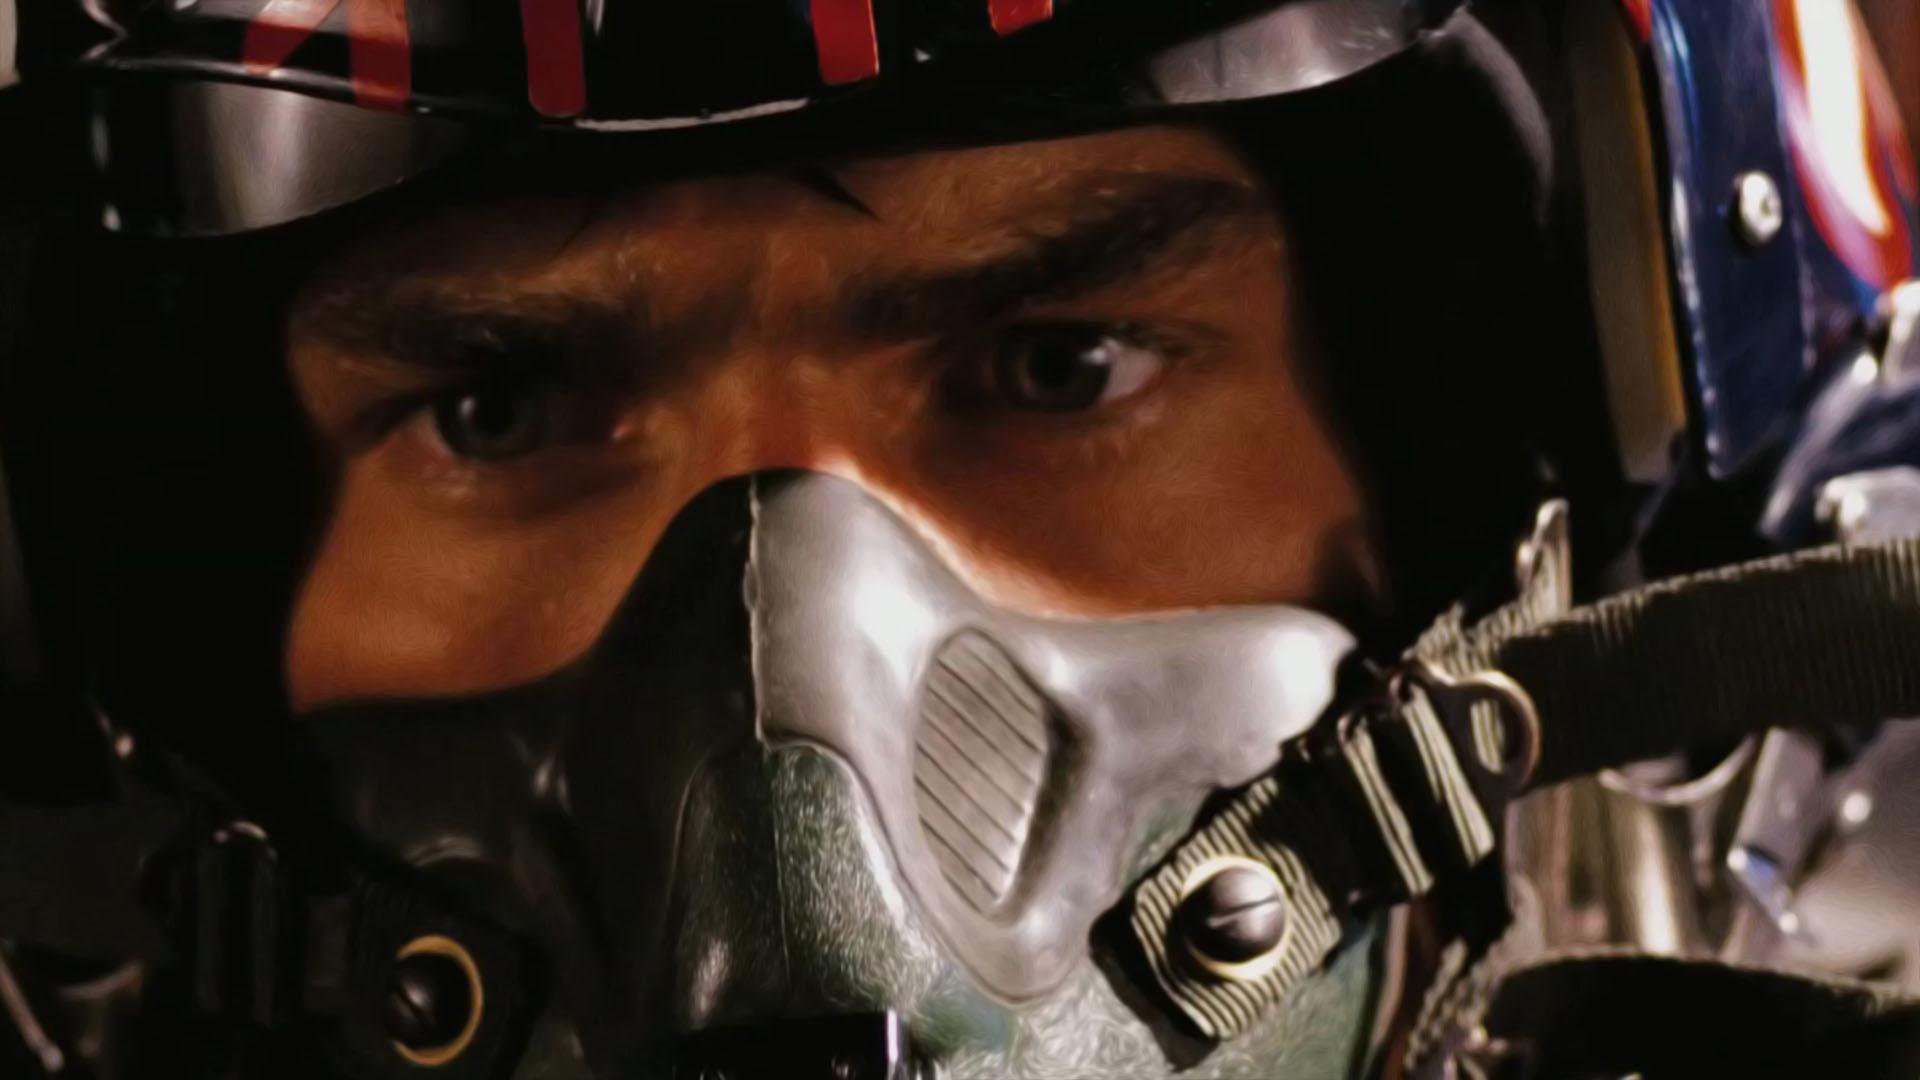 Top Gun Wallpaper HD (72+ images)